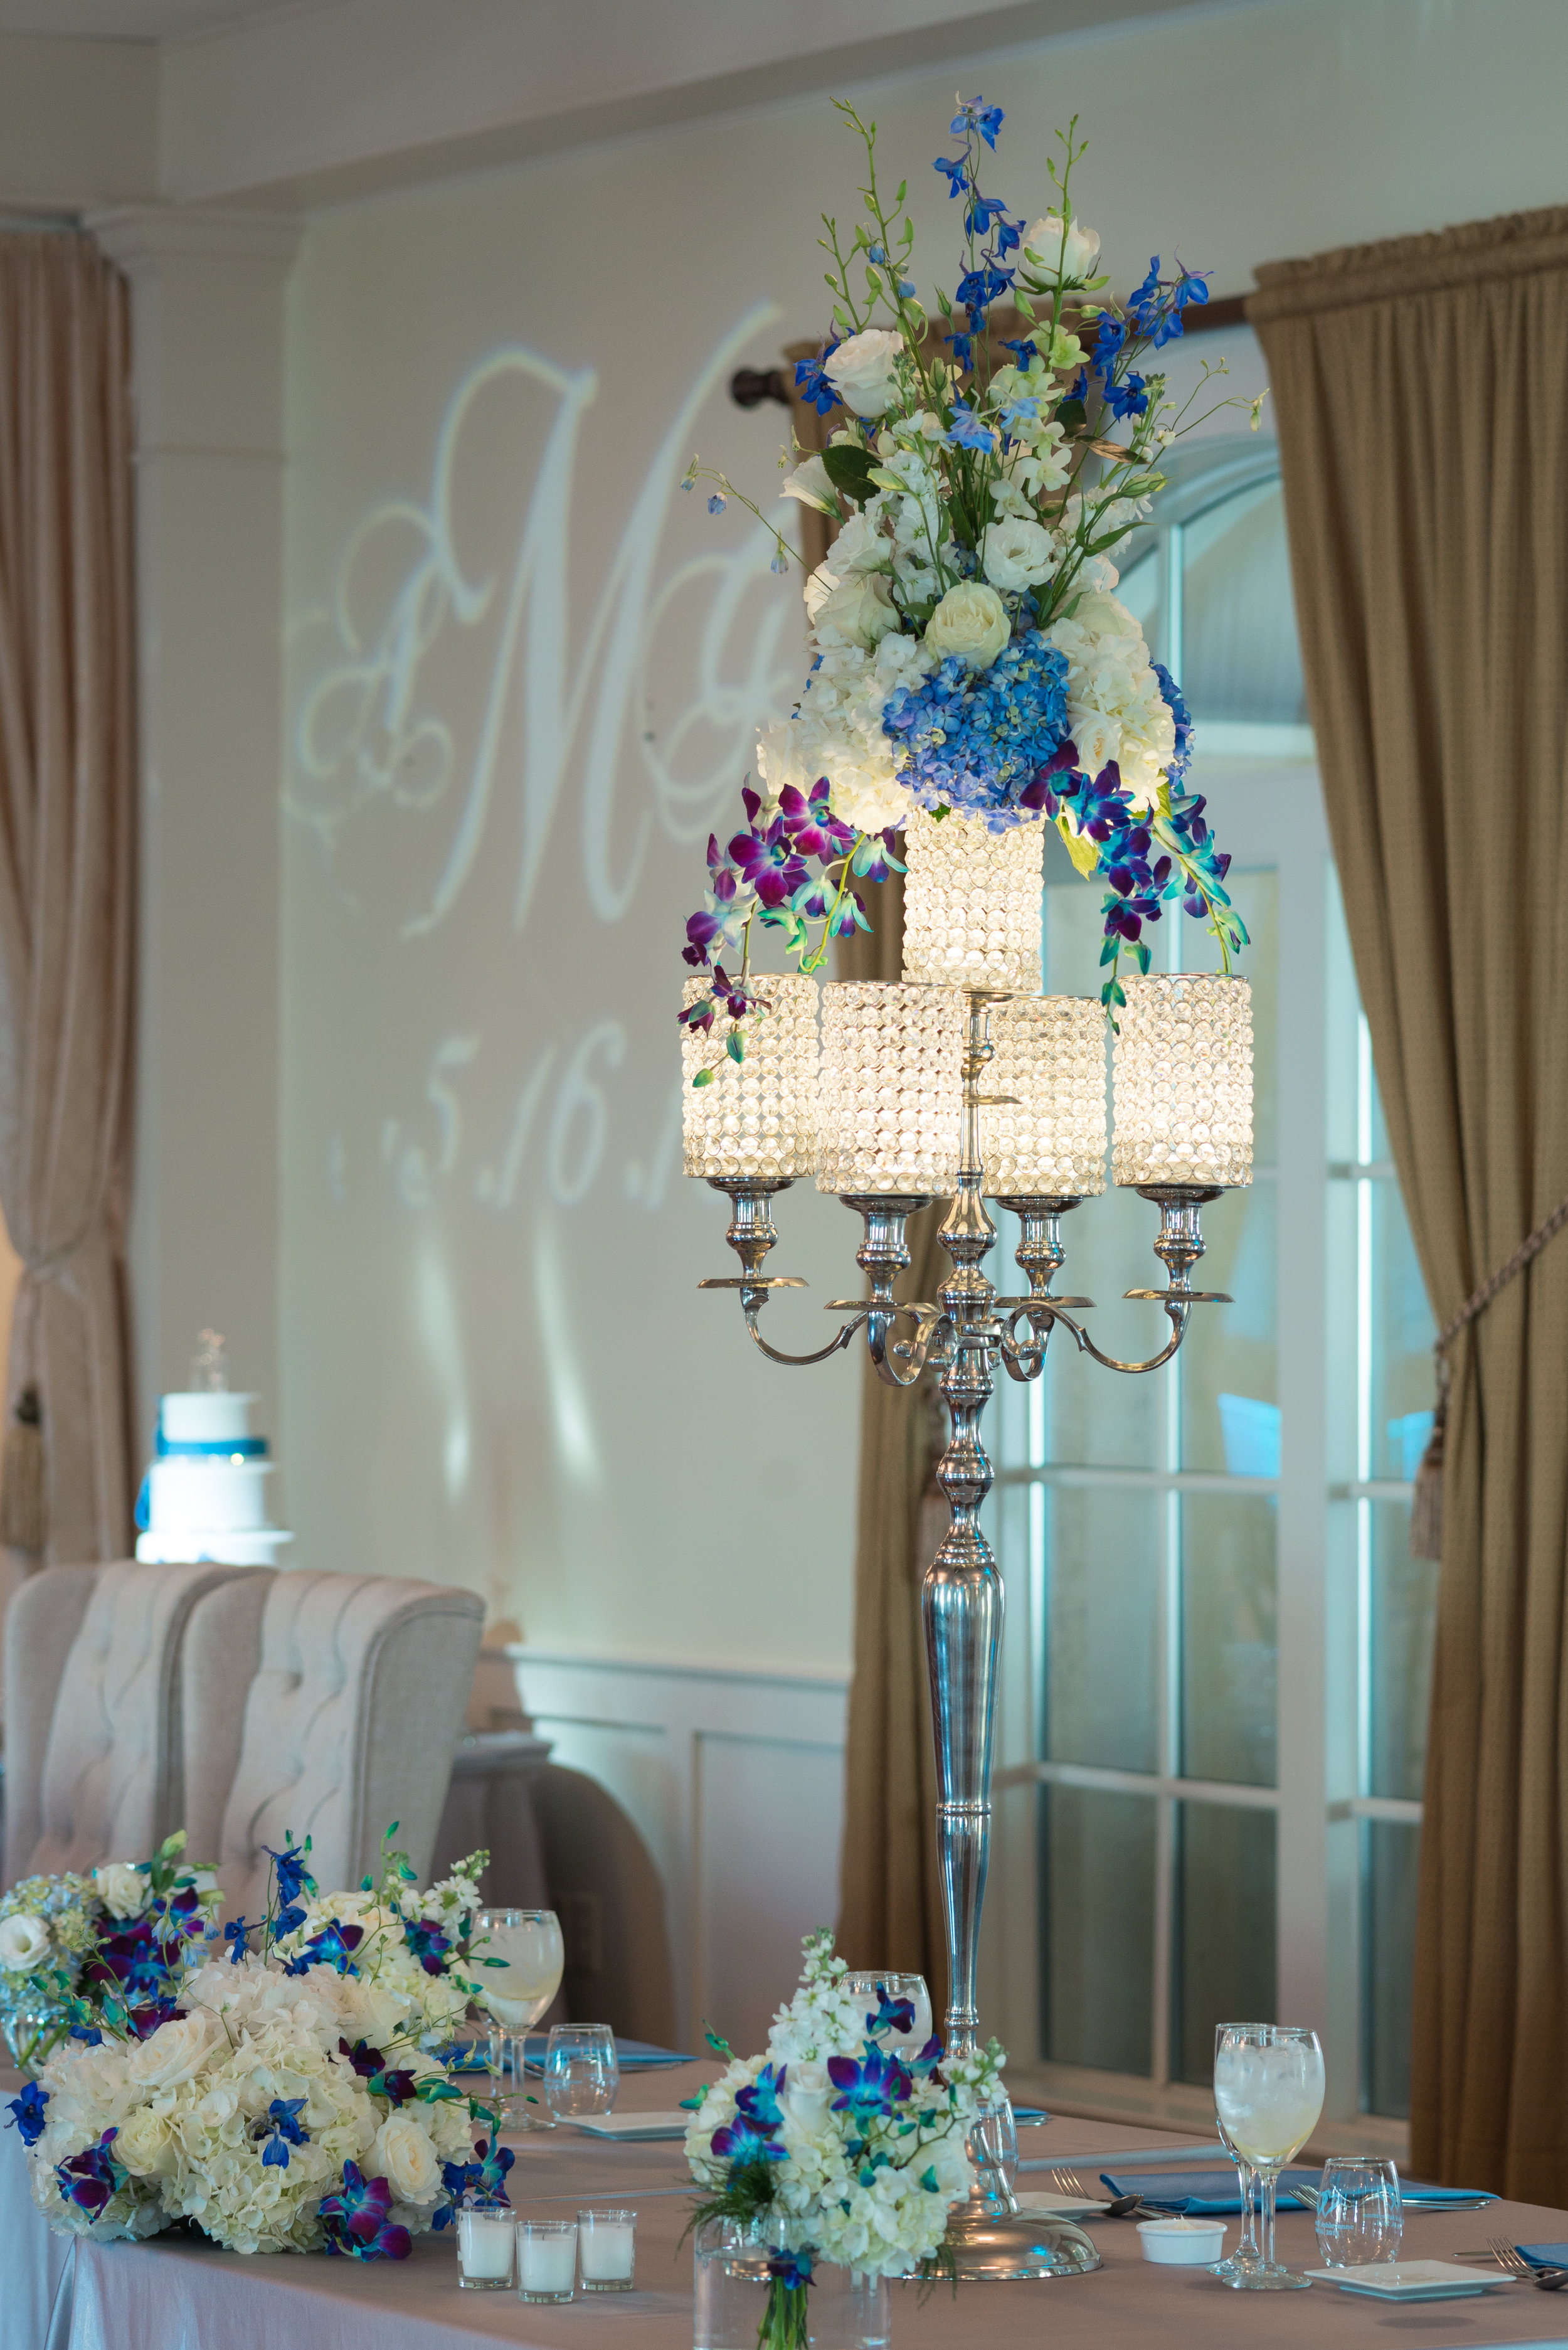 Carl-Kerridge-Photography-North-Beach-Wedding-May-2015-102.jpg